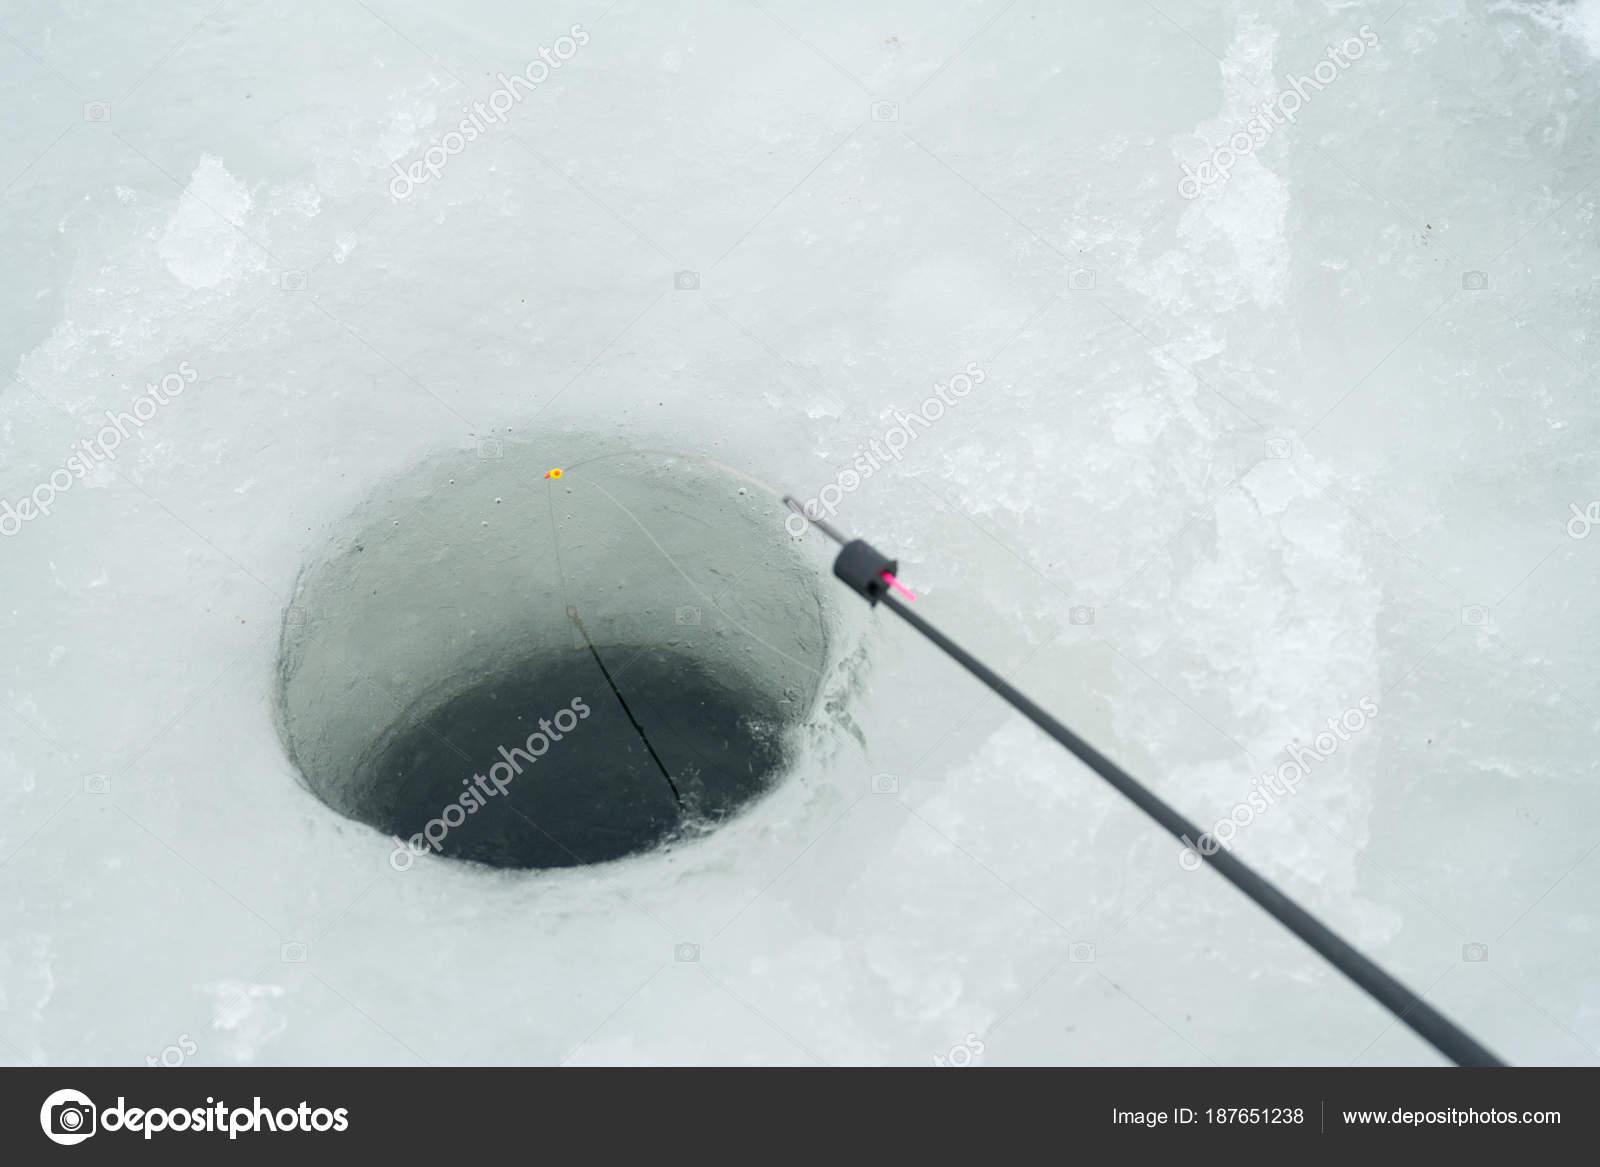 Fishing rod for winter fishing 57